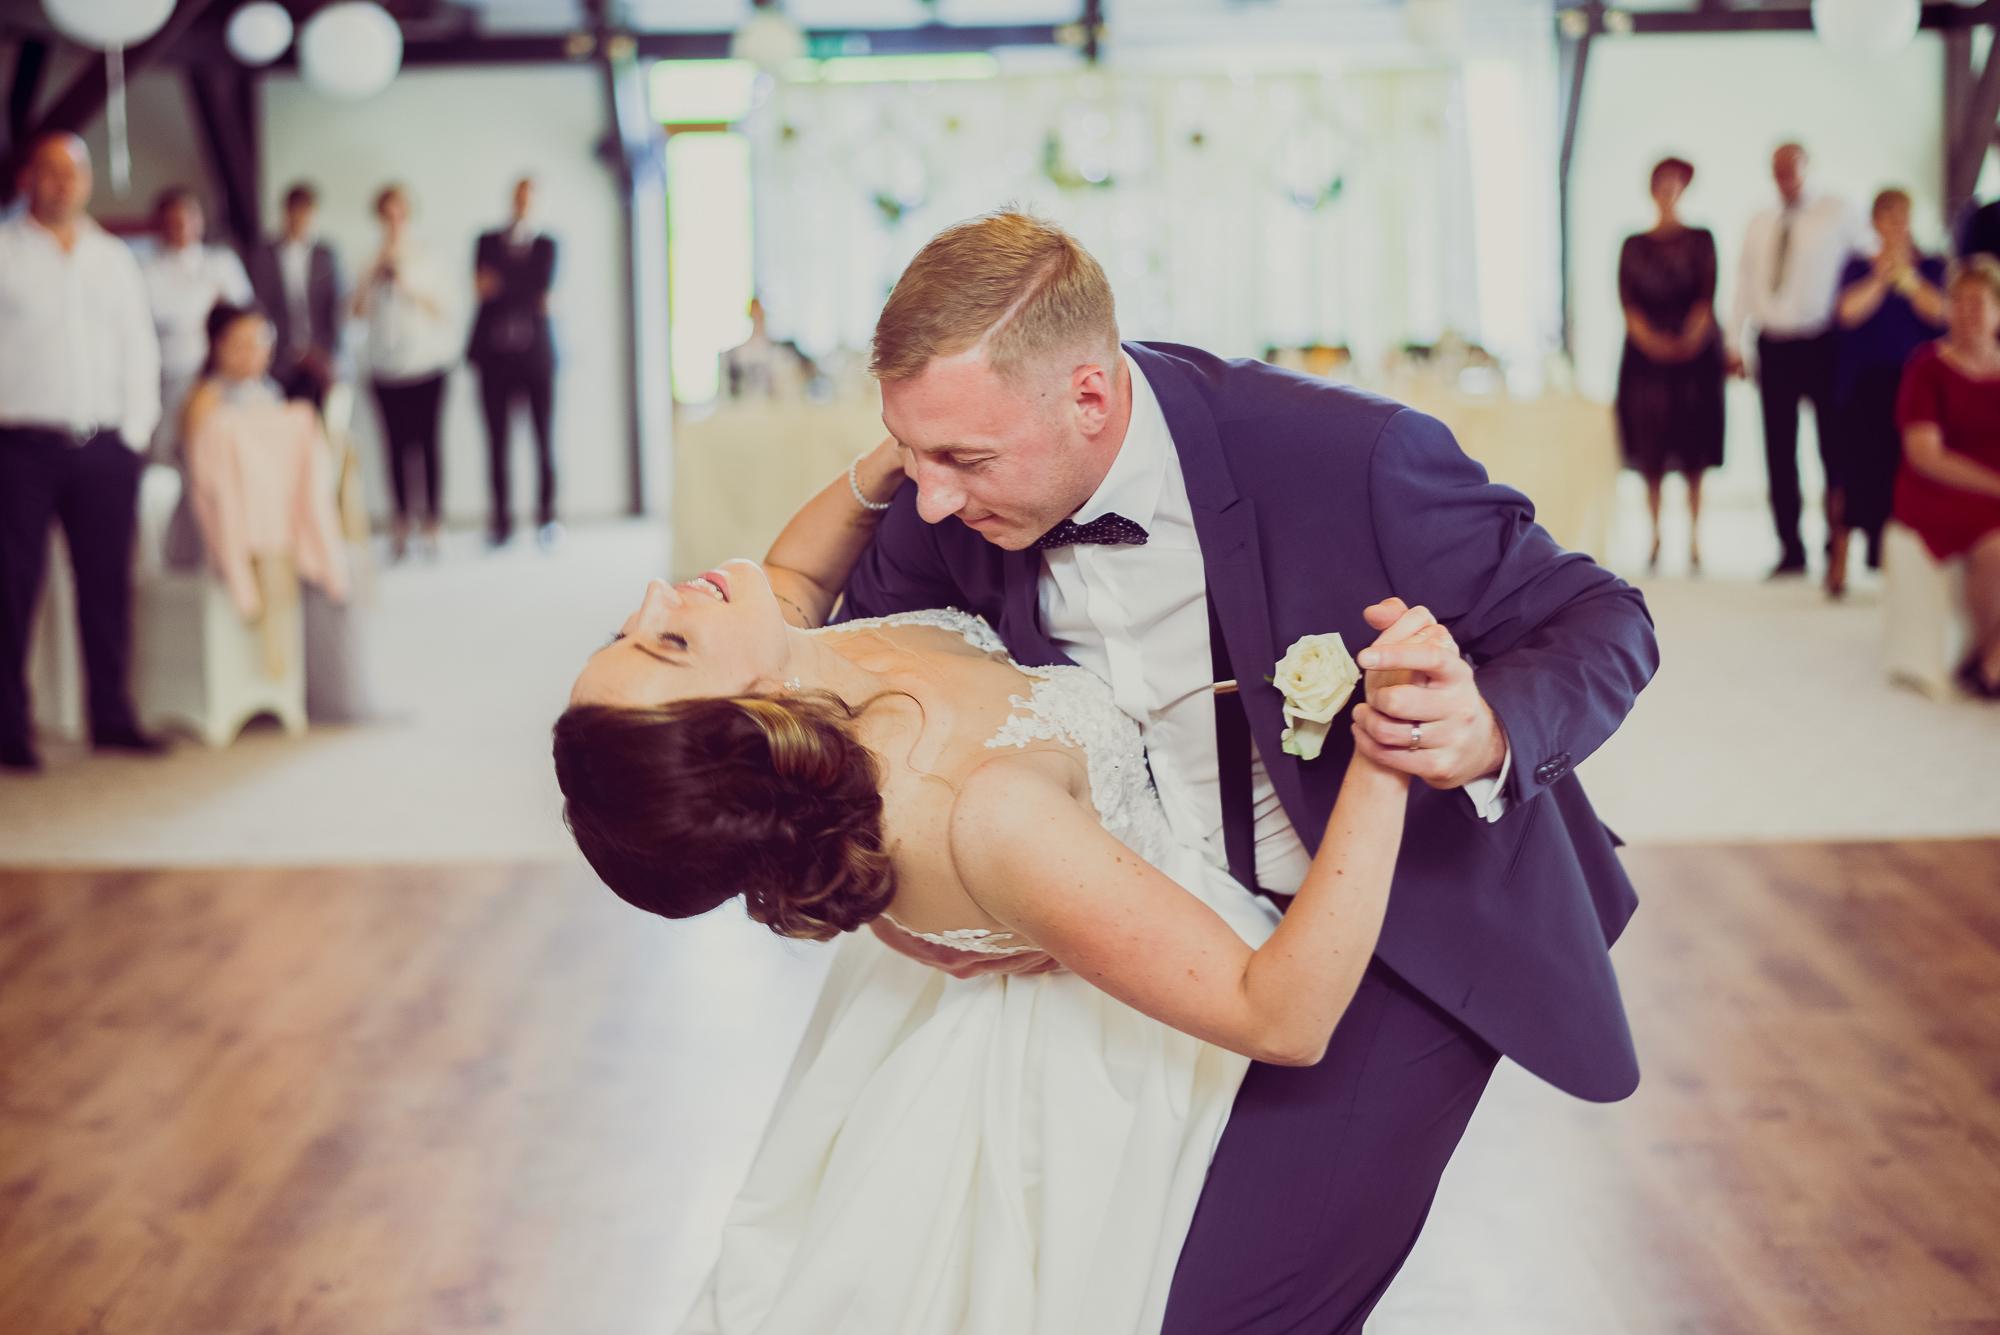 fotografie de nunta, dansul miriilor, korona king ernei,